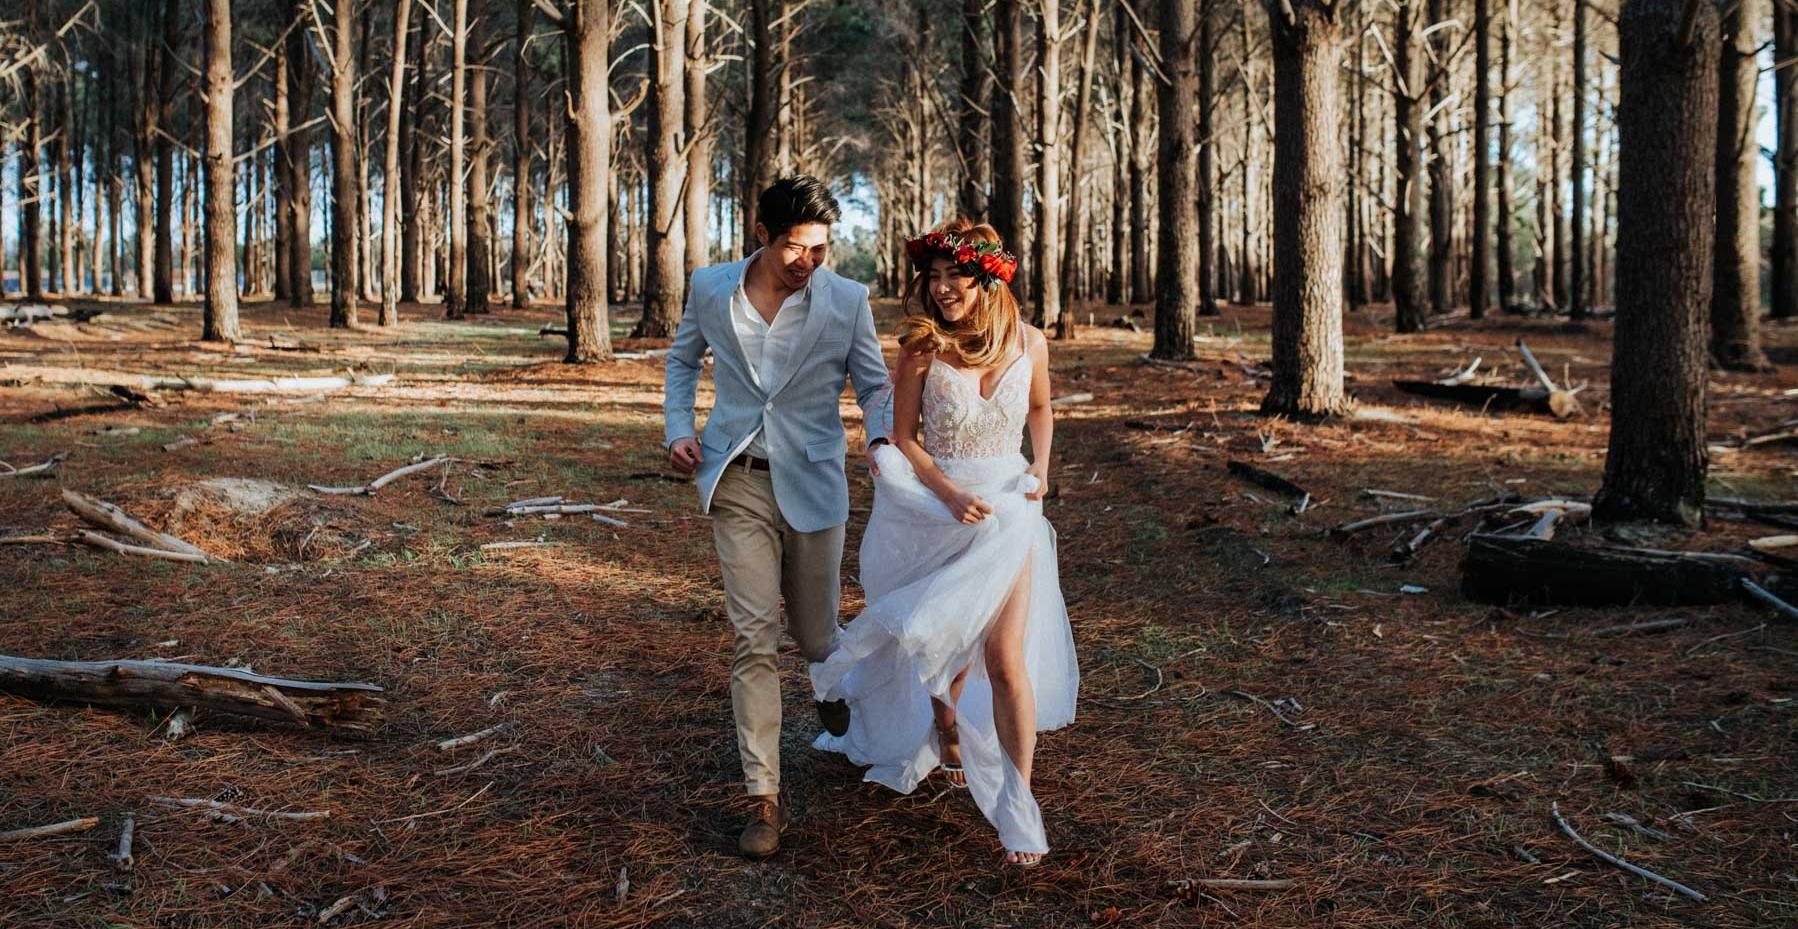 james-julene-forest-elopement-perth-34.JPG